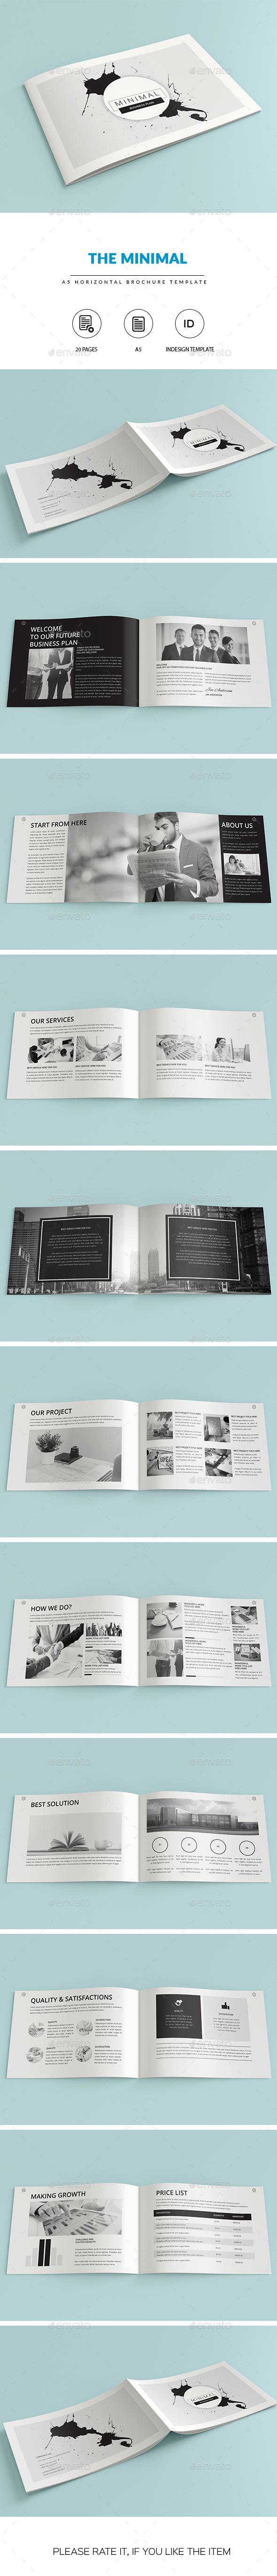 MINIMAL | A5 Business Brochure-Indesign Template - Catalogs Brochures